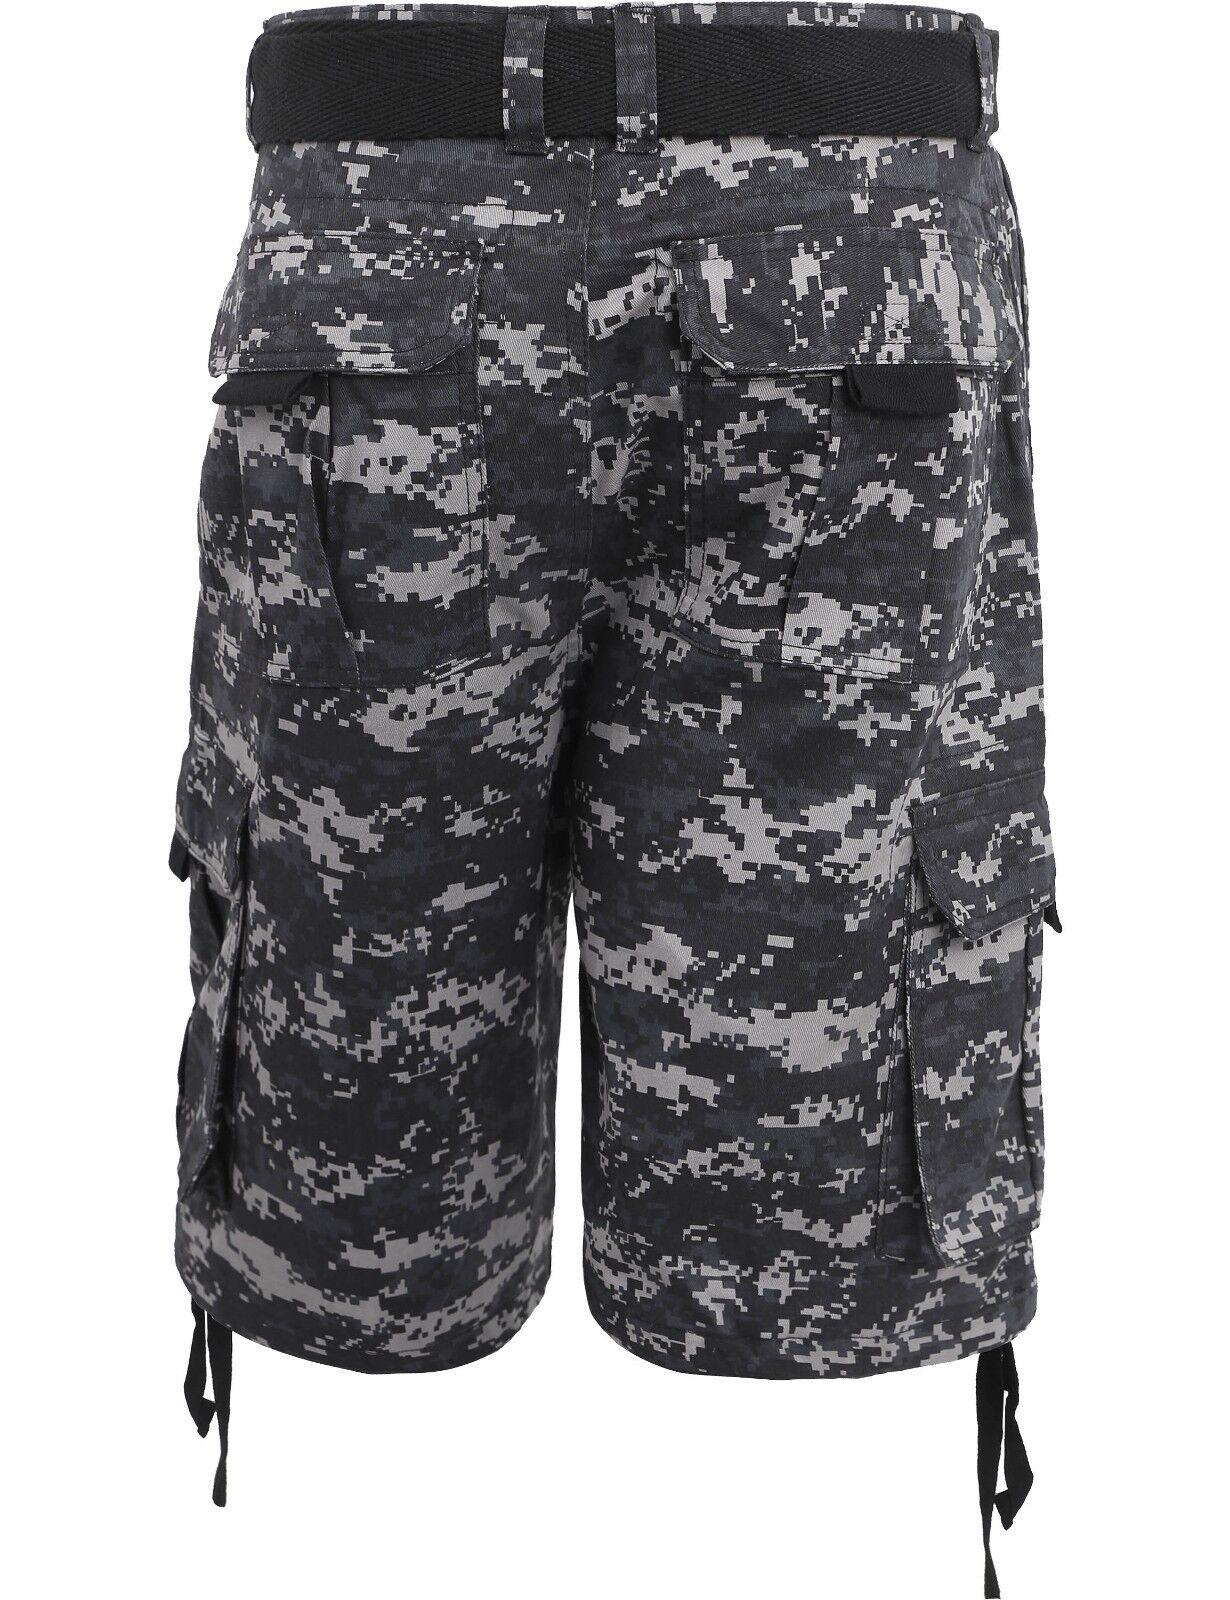 Mens Cargo Shorts with Belt 30 52 Twill Short Camo Pants Summer Multi Pocket